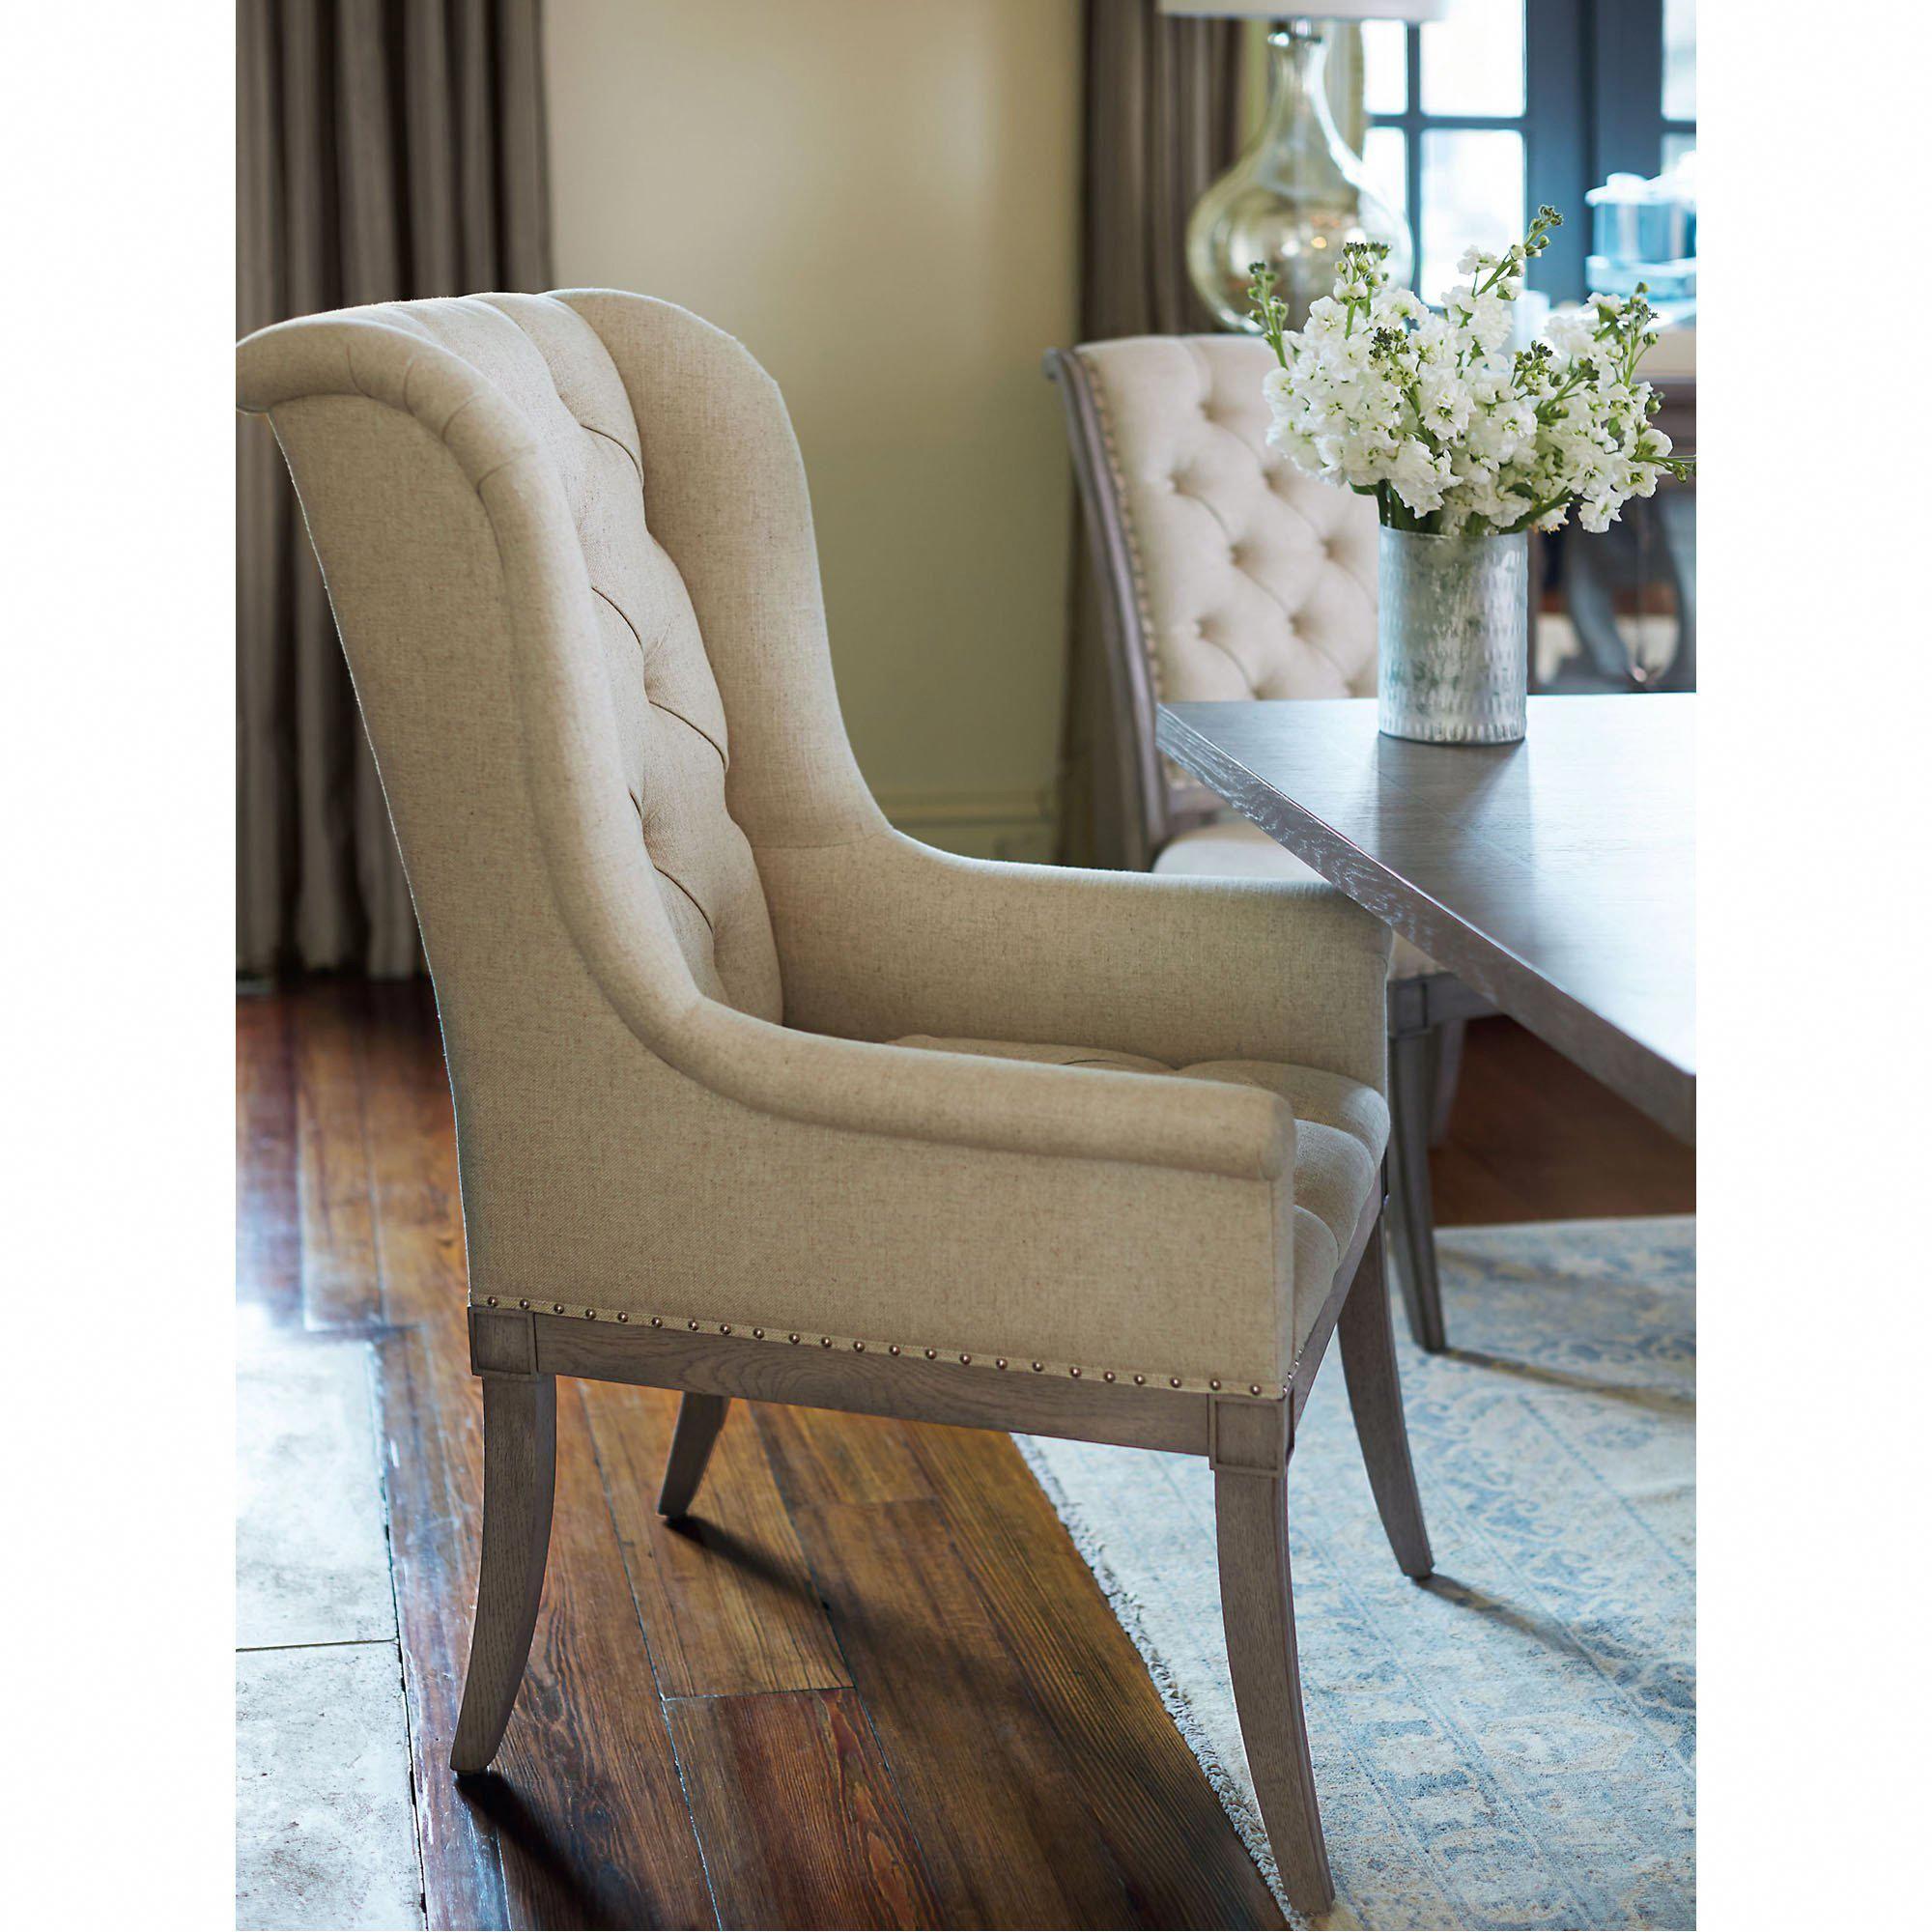 Bernhardt Marquesa Host Dining Chair Features Gray Cashmere